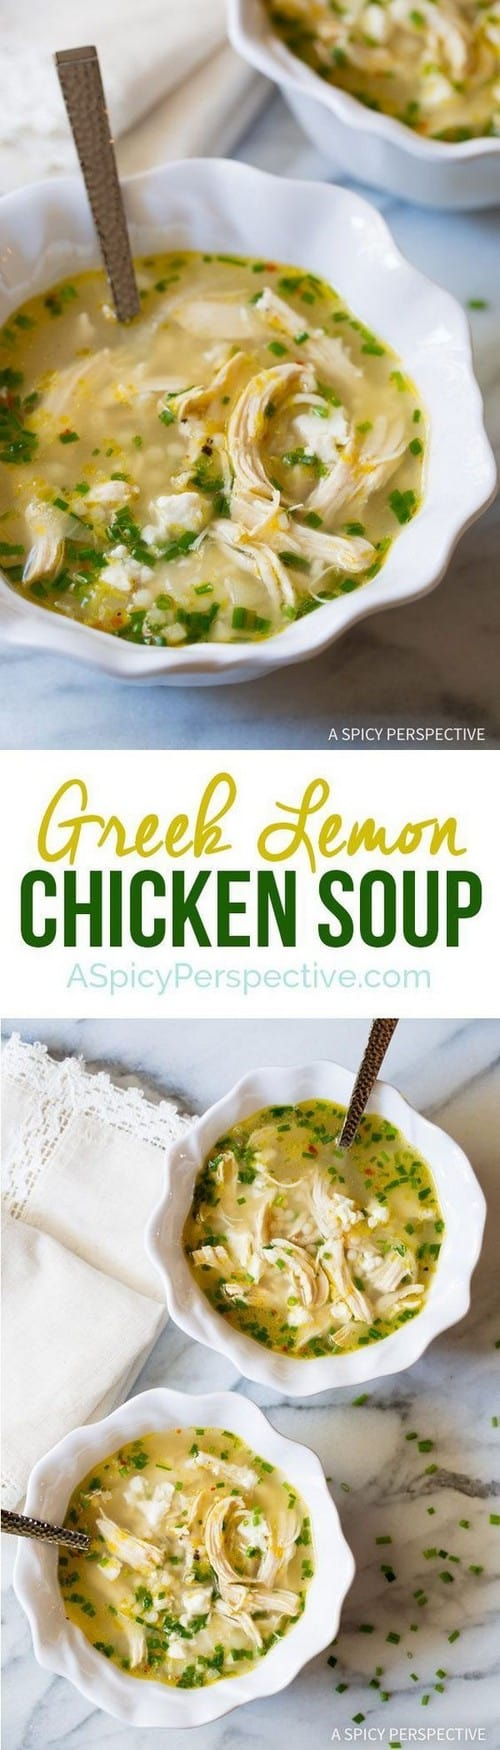 Mediterranean Greek Lemon Chicken Soup